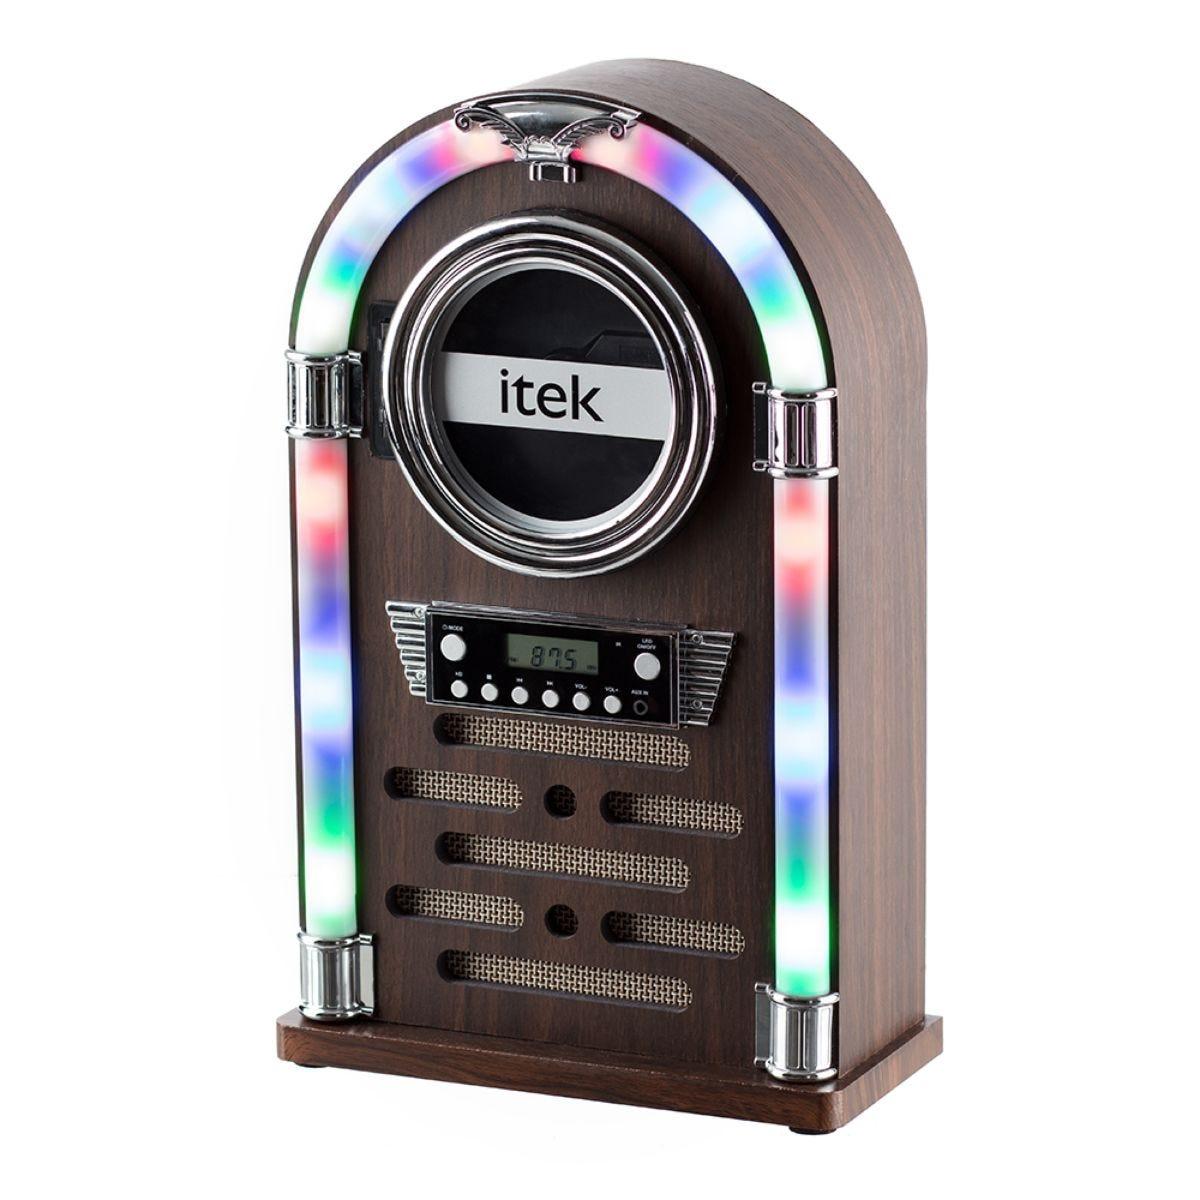 Itek Mini Bluetooth Jukebox with CD Player and Radio - Wood